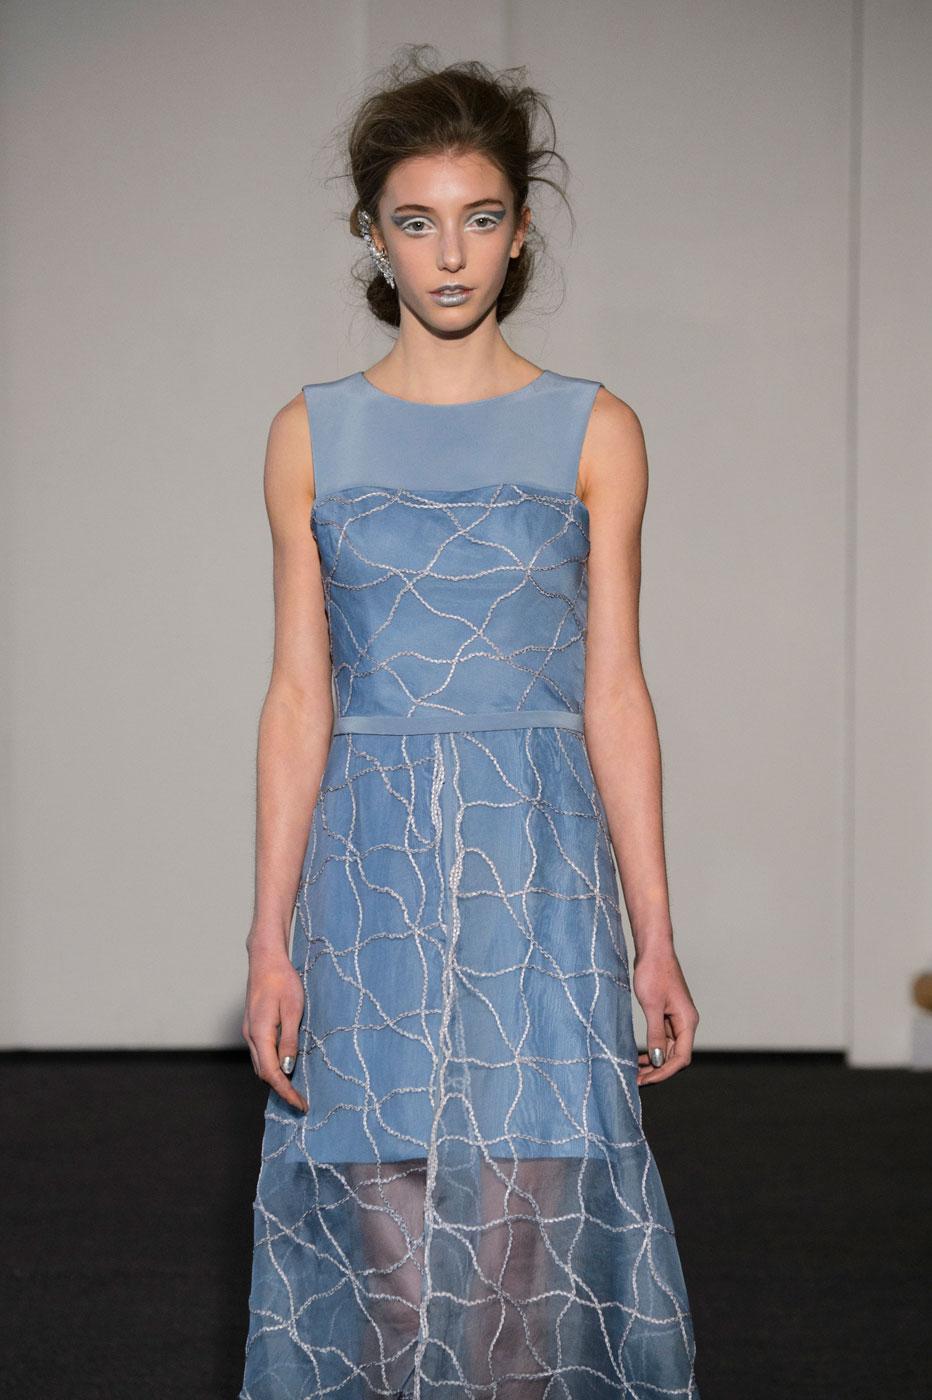 Busardi-fashion-runway-show-haute-couture-paris-spring-2015-the-impression-14